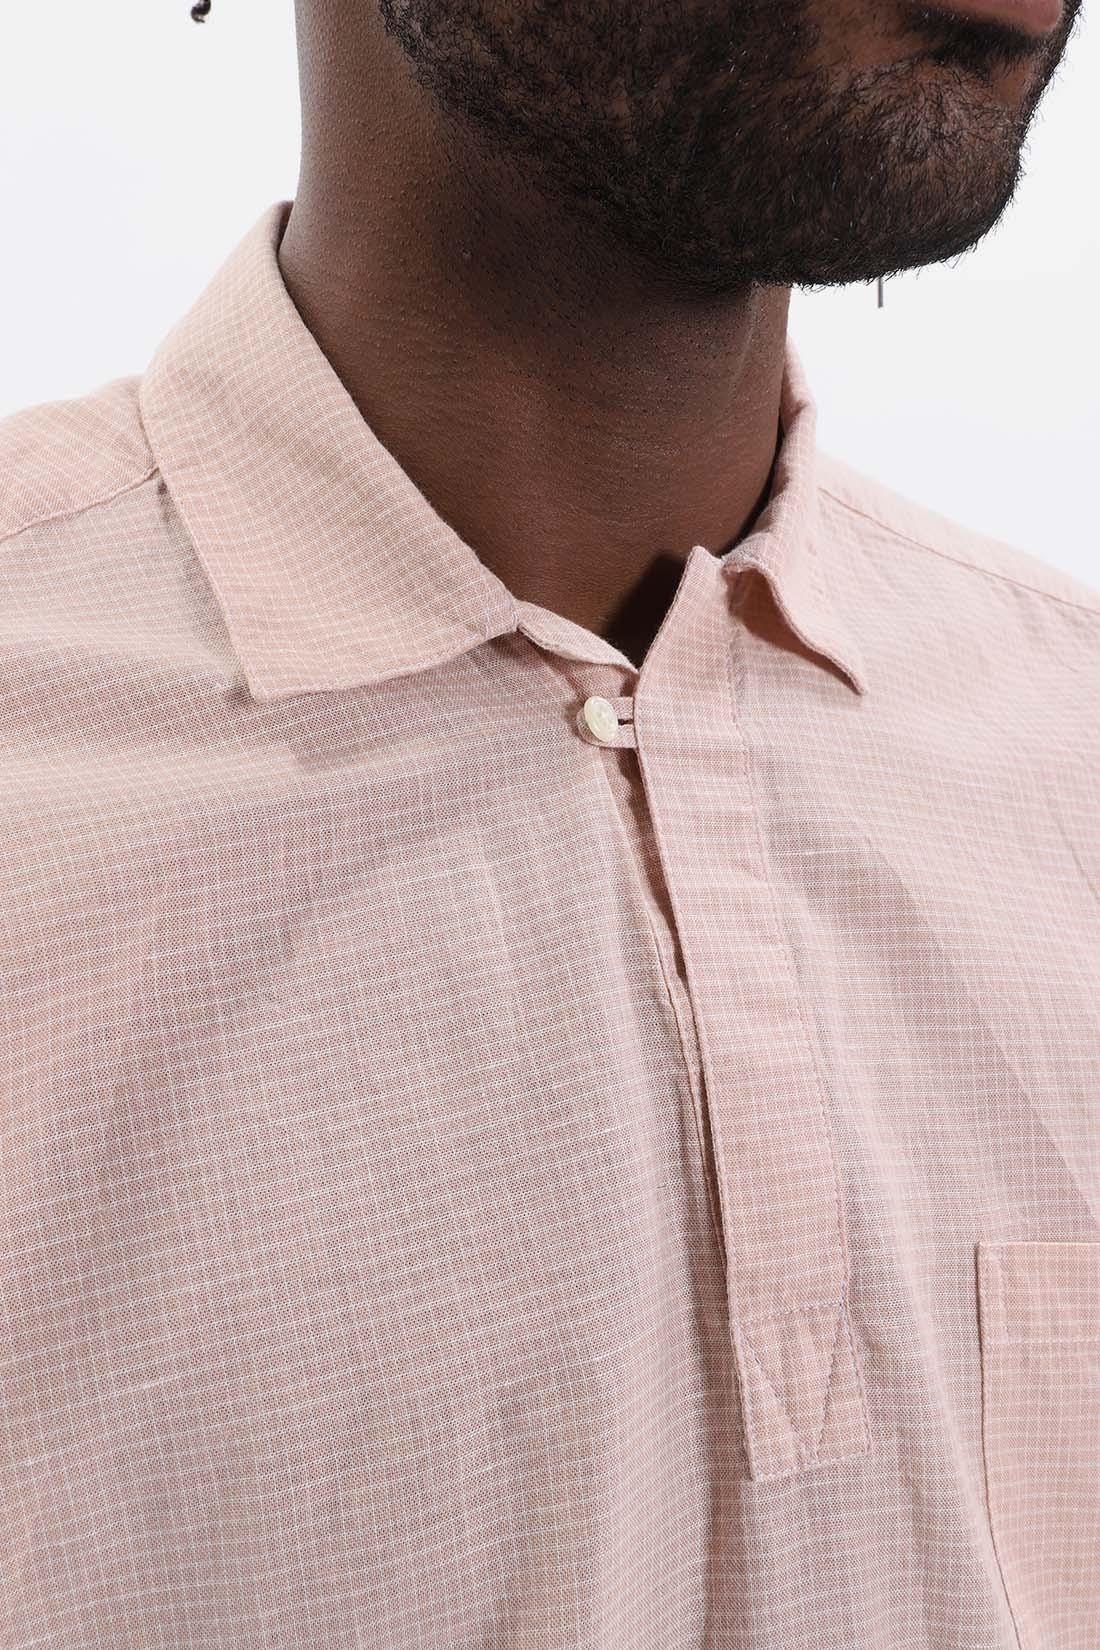 OLIVER SPENCER / Yarmouth shirt Pink